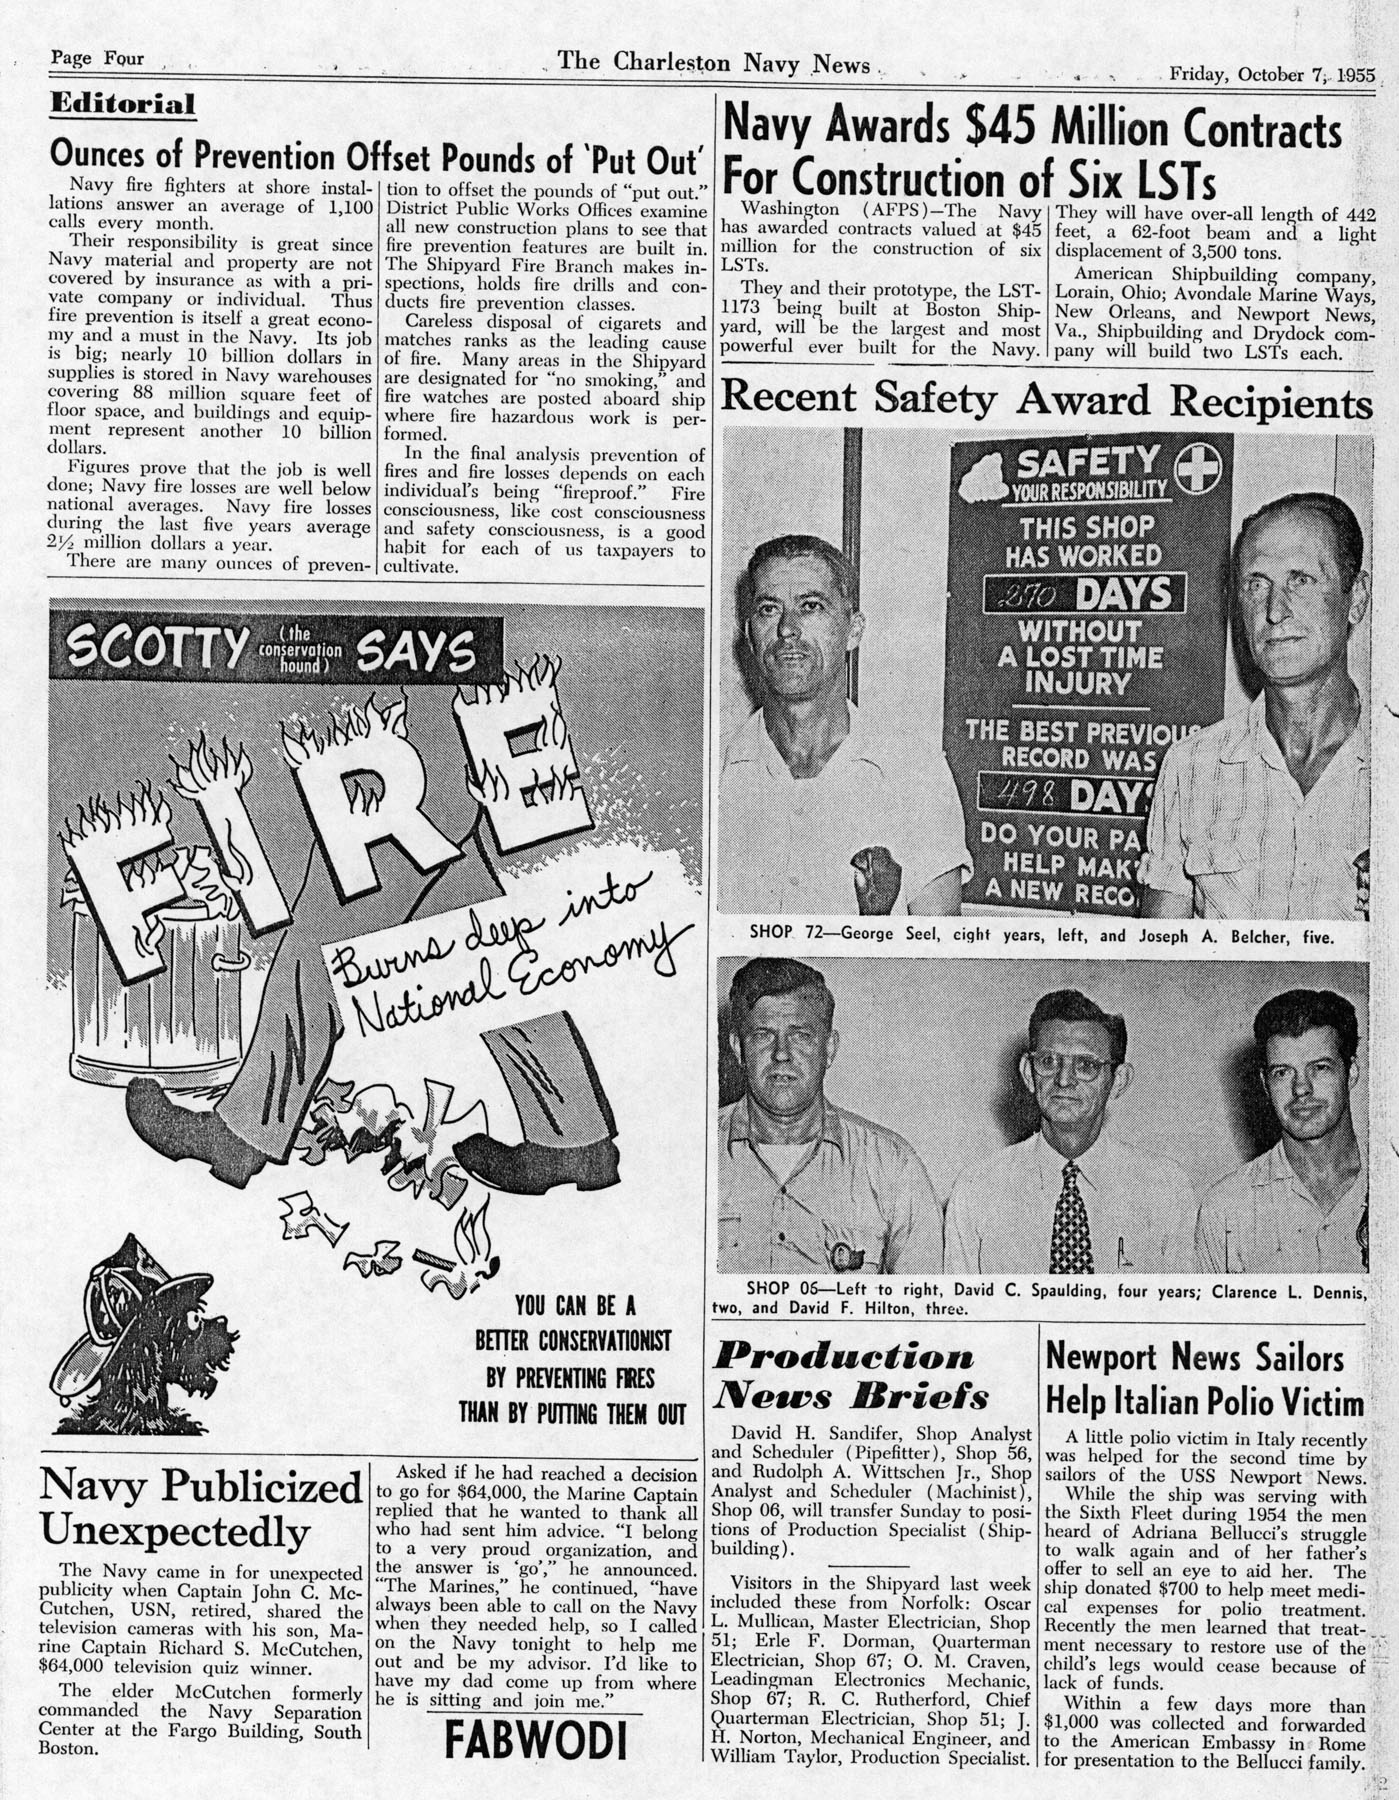 The Charleston Navy News, Volume 14, Edition 6, page iv